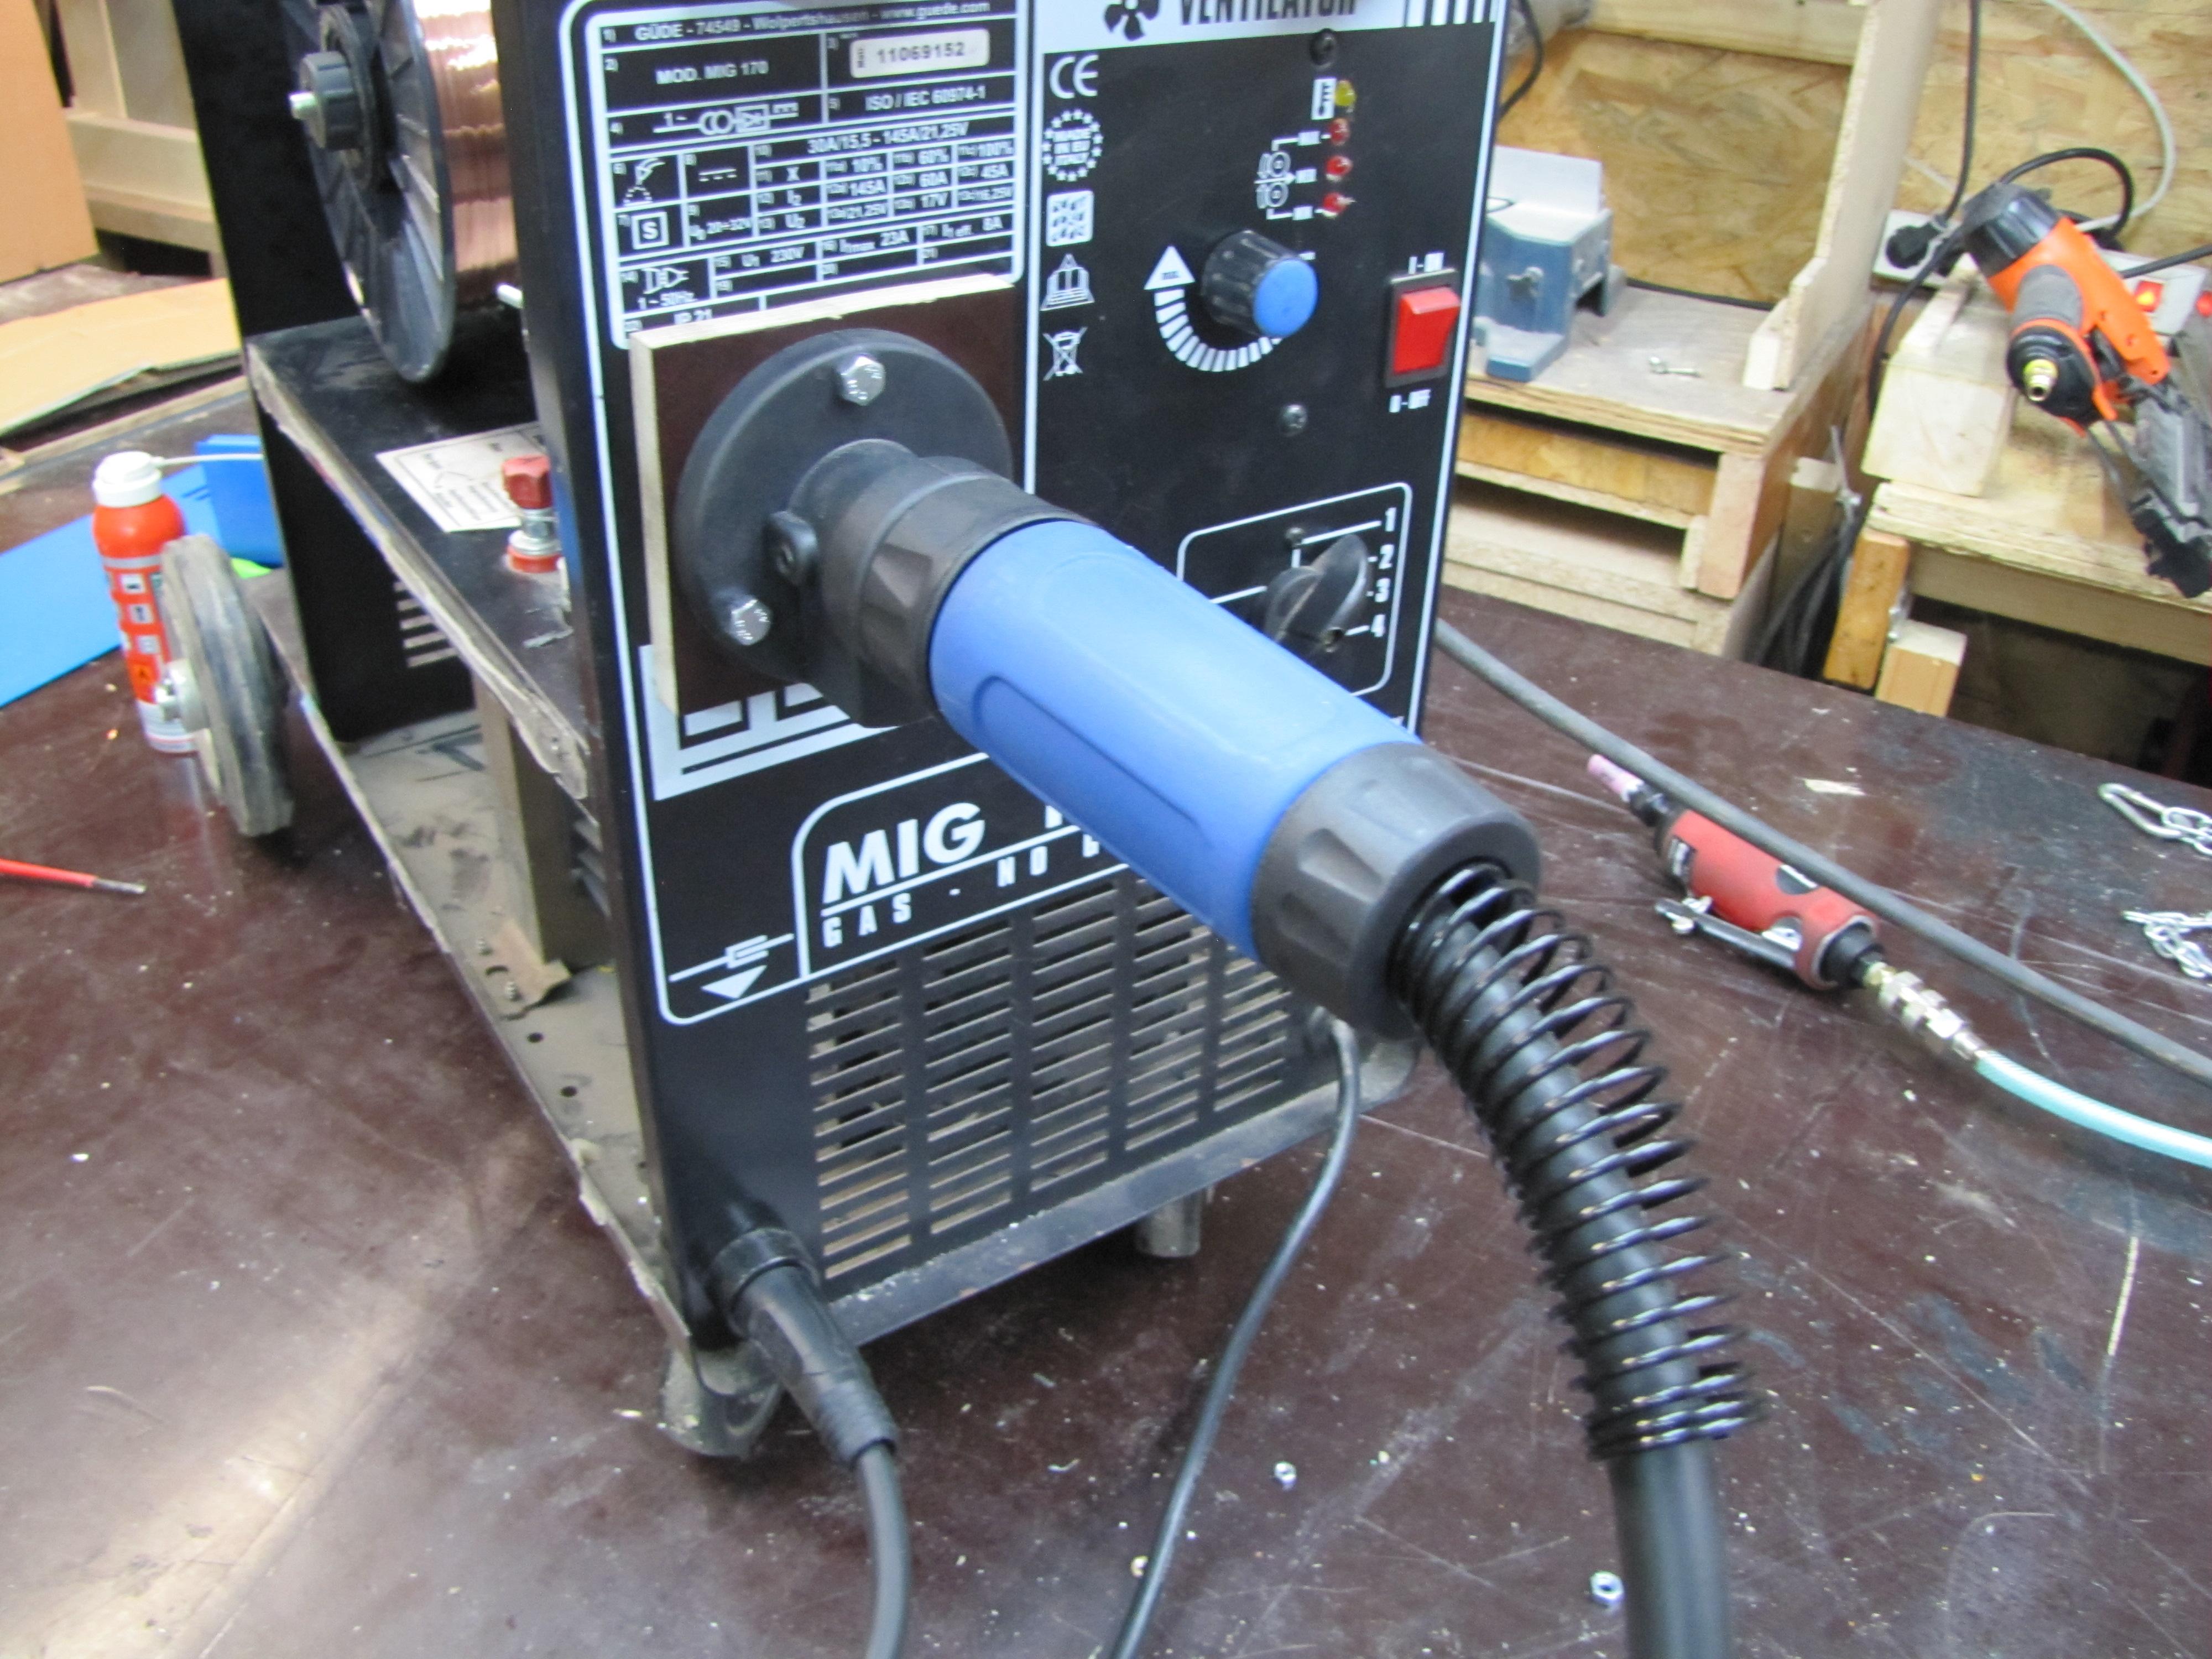 Zentralanschluss-Umbau Set MIG//MAG Schweißgeräte Euro anschluss Zentraladapter